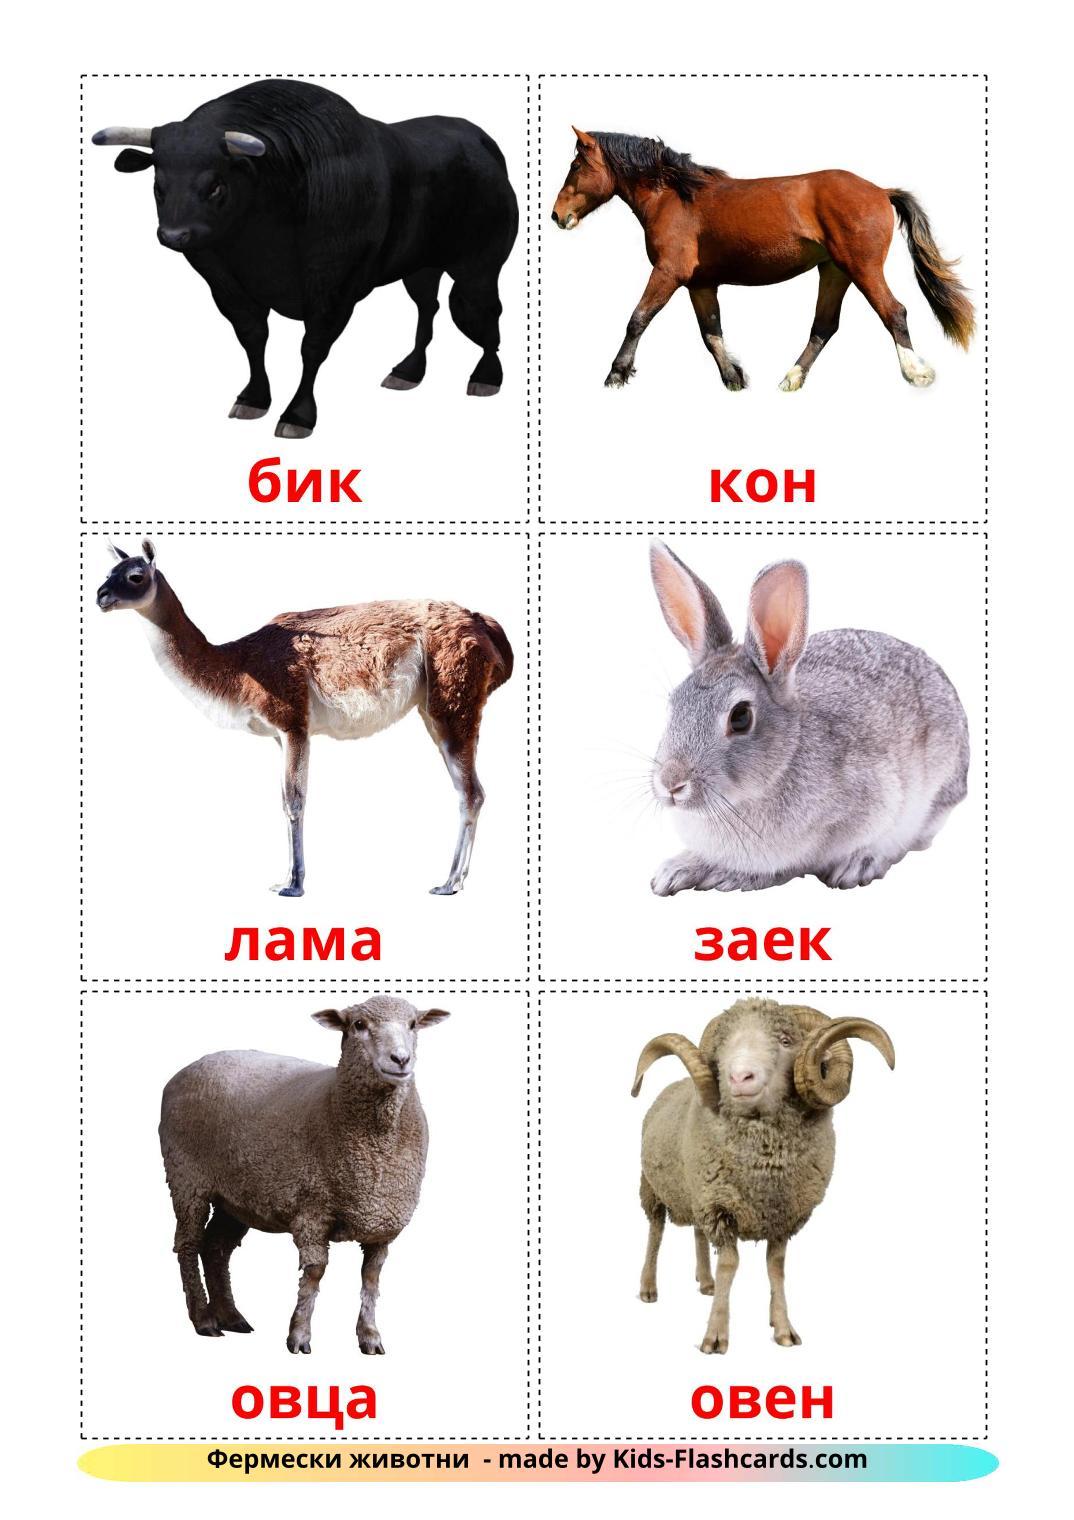 Farm animals - 15 Free Printable bulgarian Flashcards